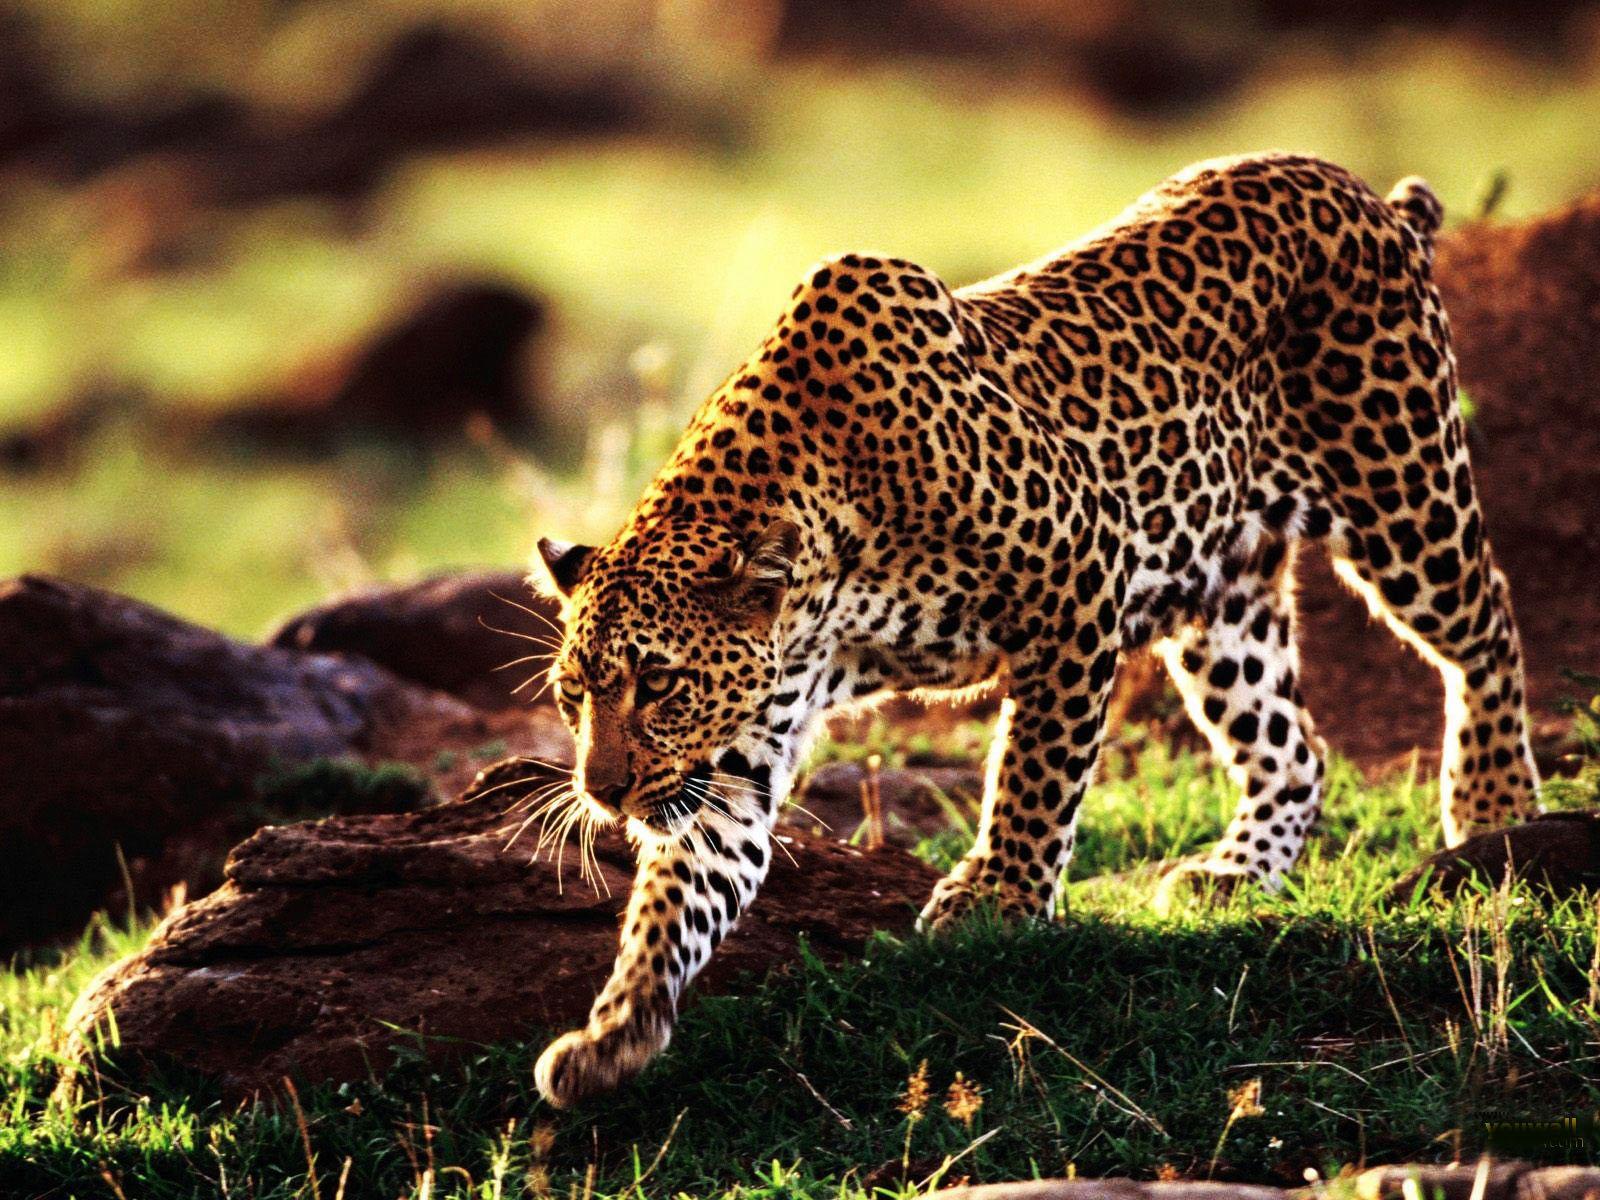 Beautiful cheetah latest hd wallpapers images 2013 - Animal and bird hd wallpaper ...